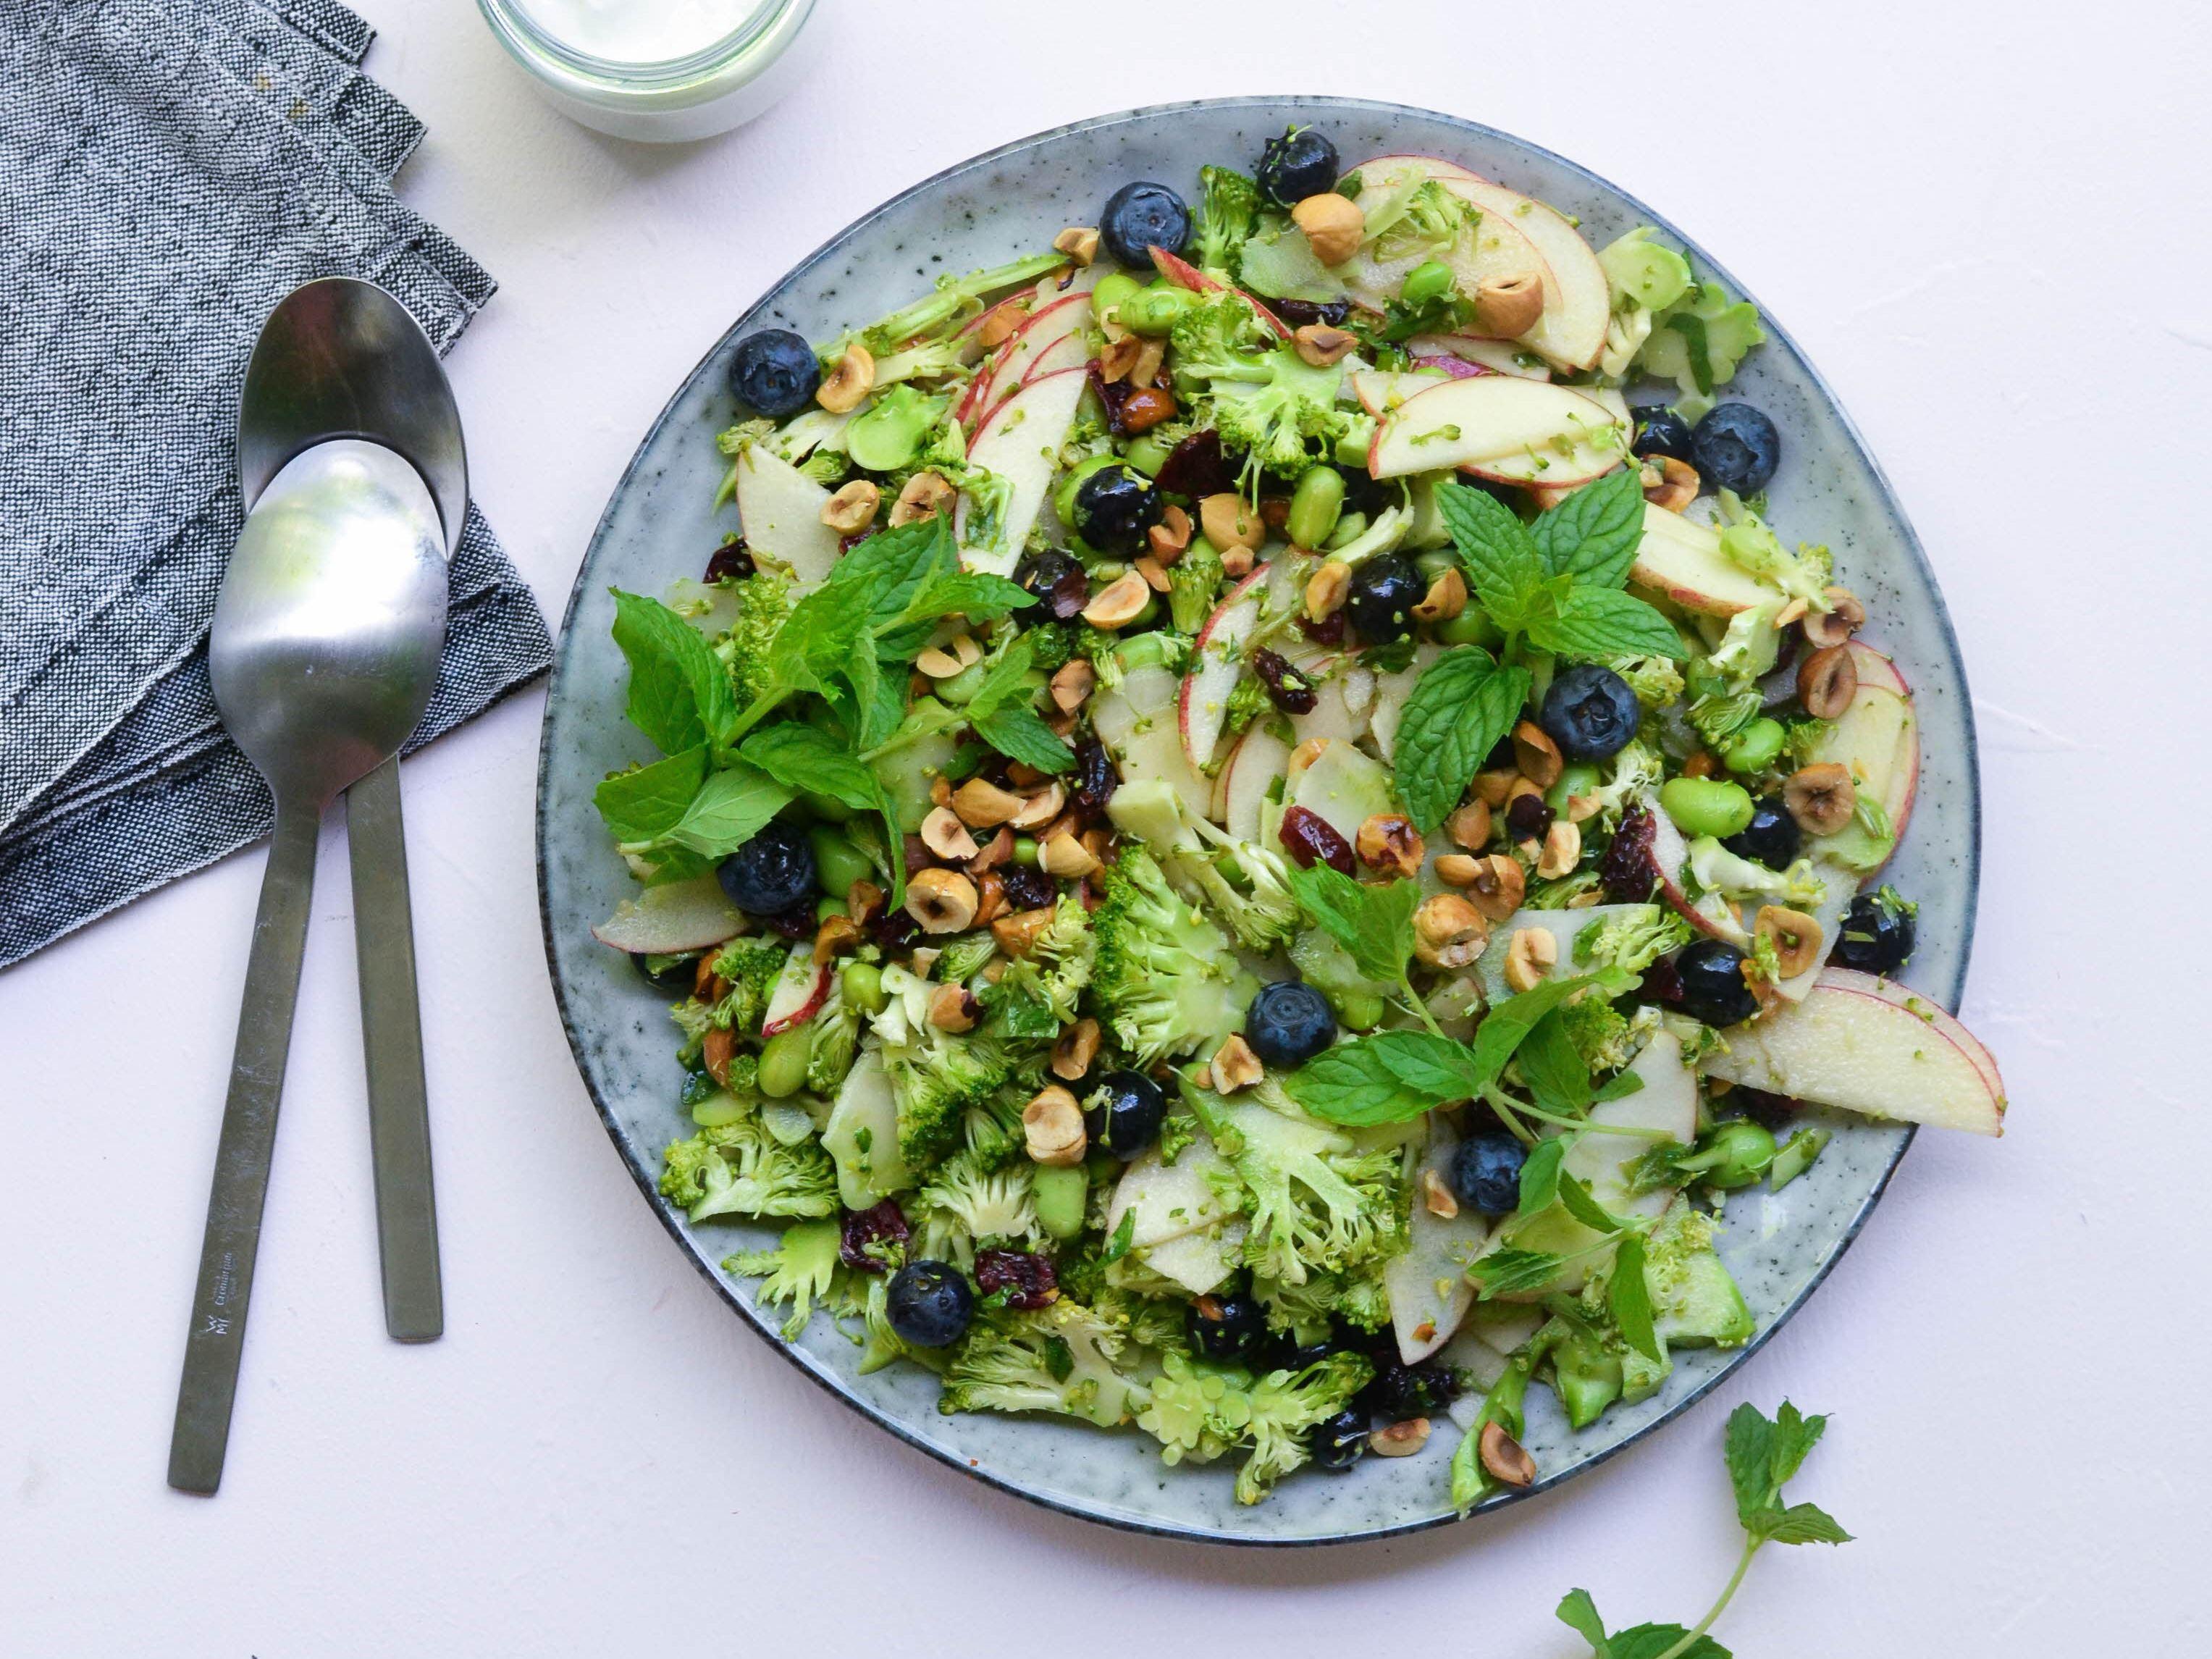 Broccolisalat med blåbær og mynte